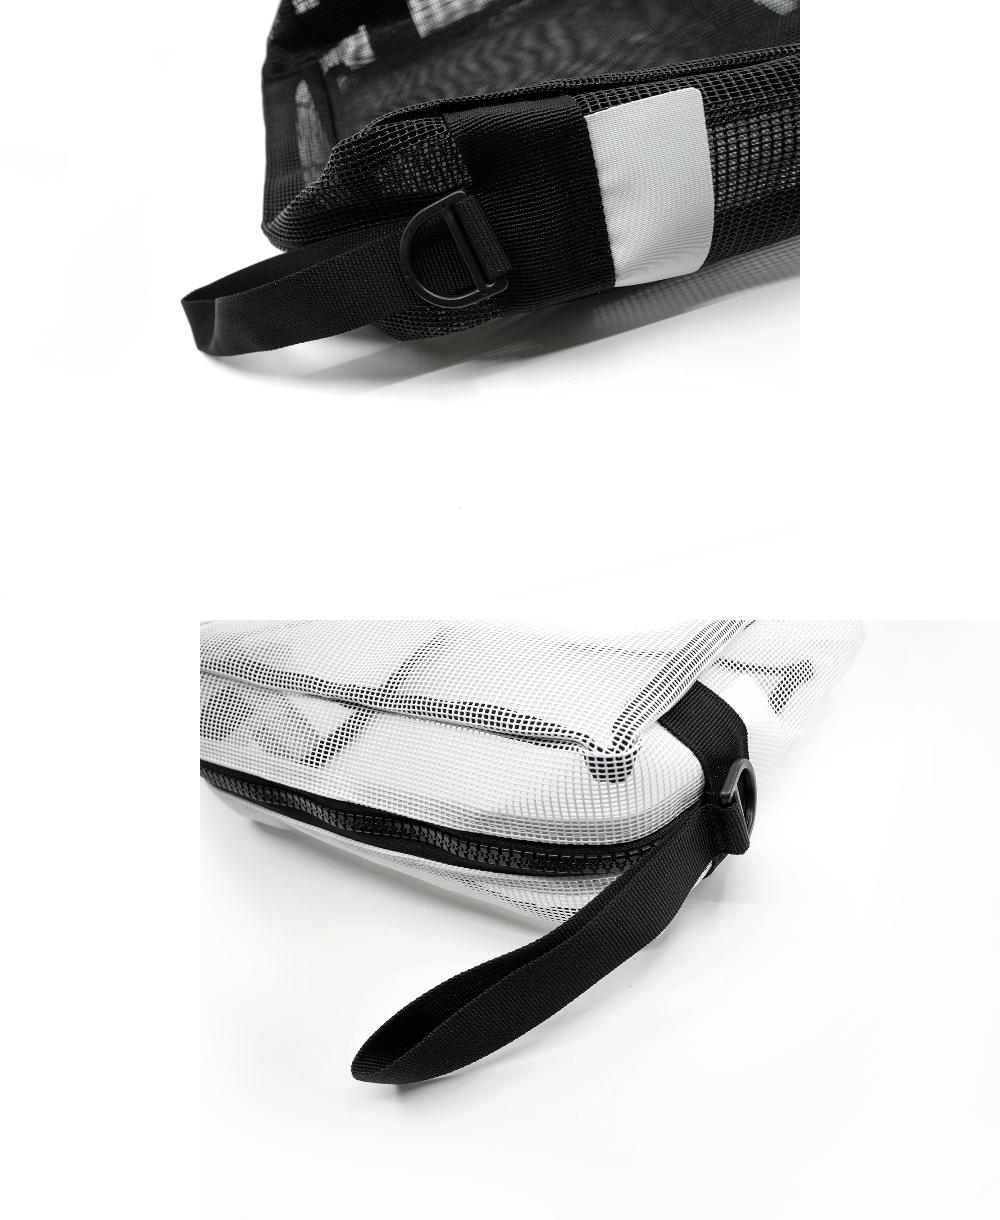 bag detail image-S1L9